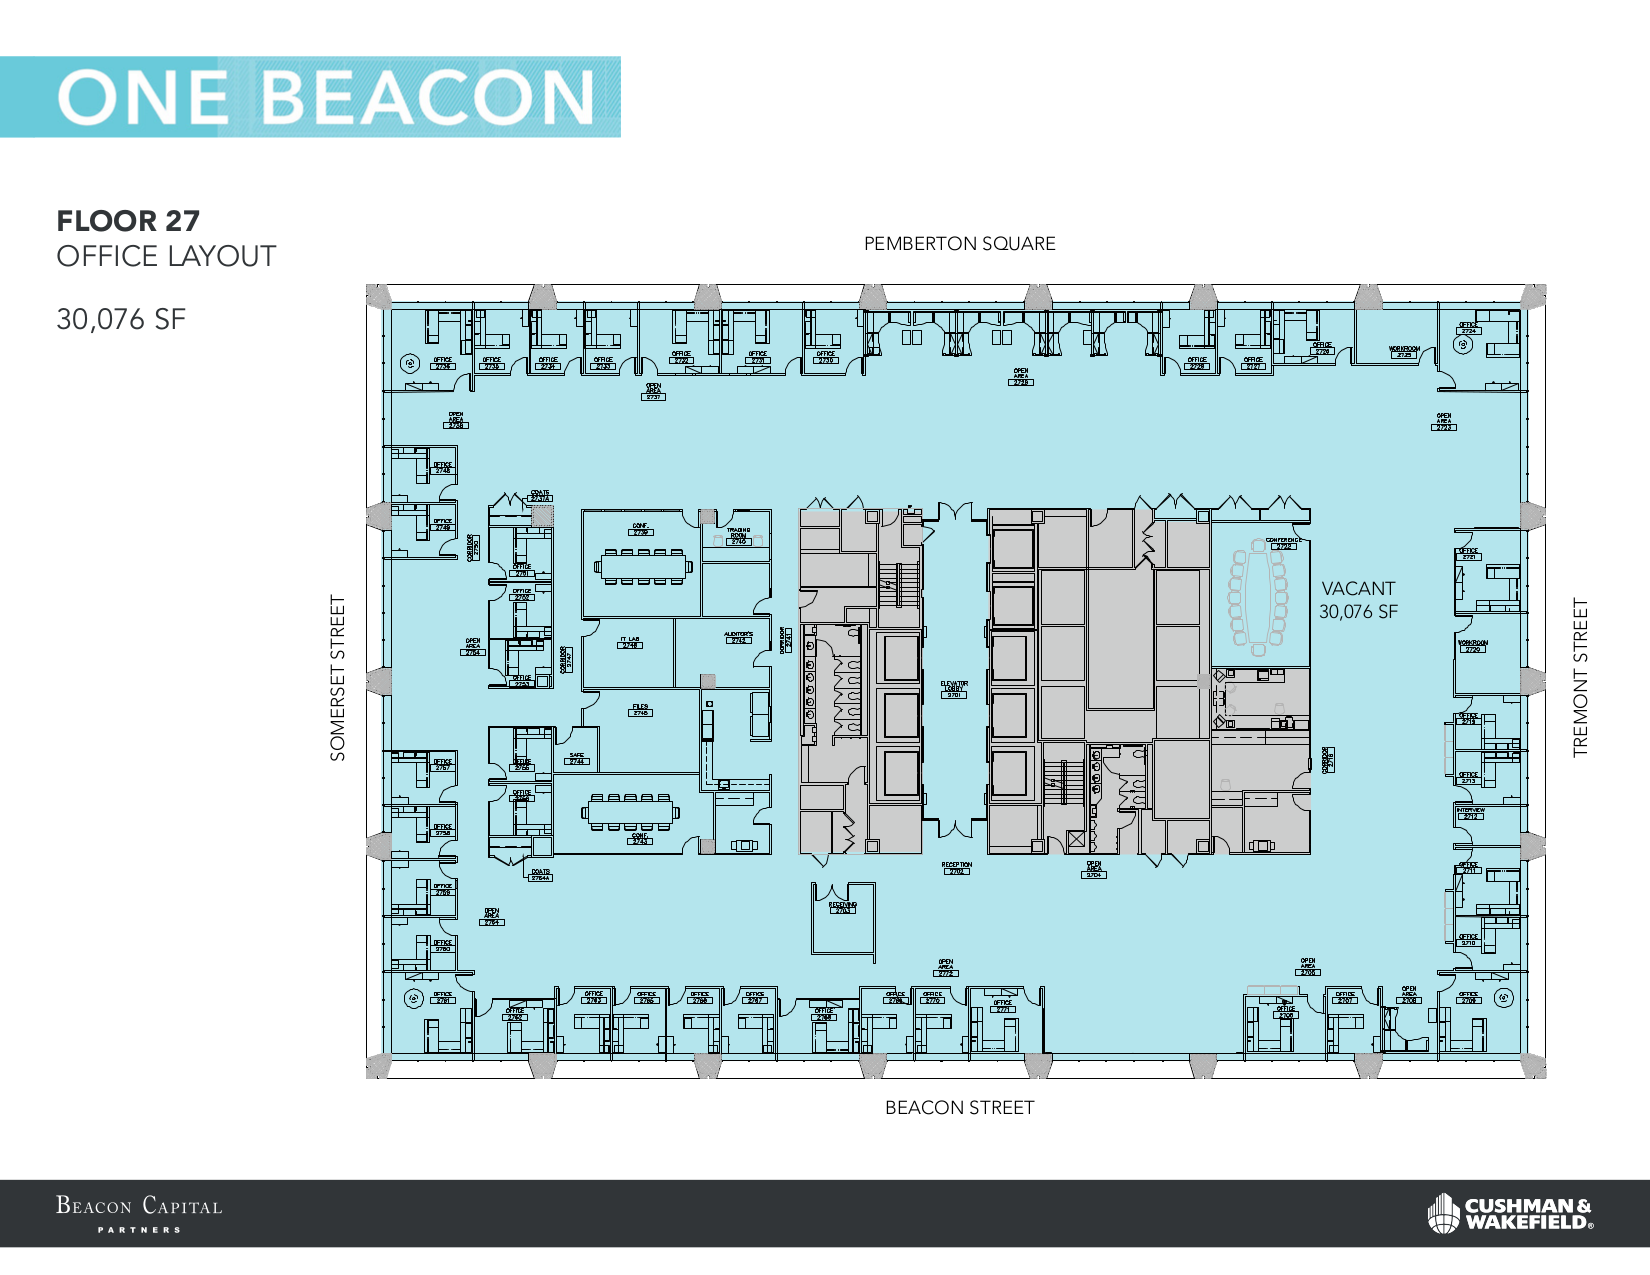 1 Beacon Street Old 27th Floor Vts